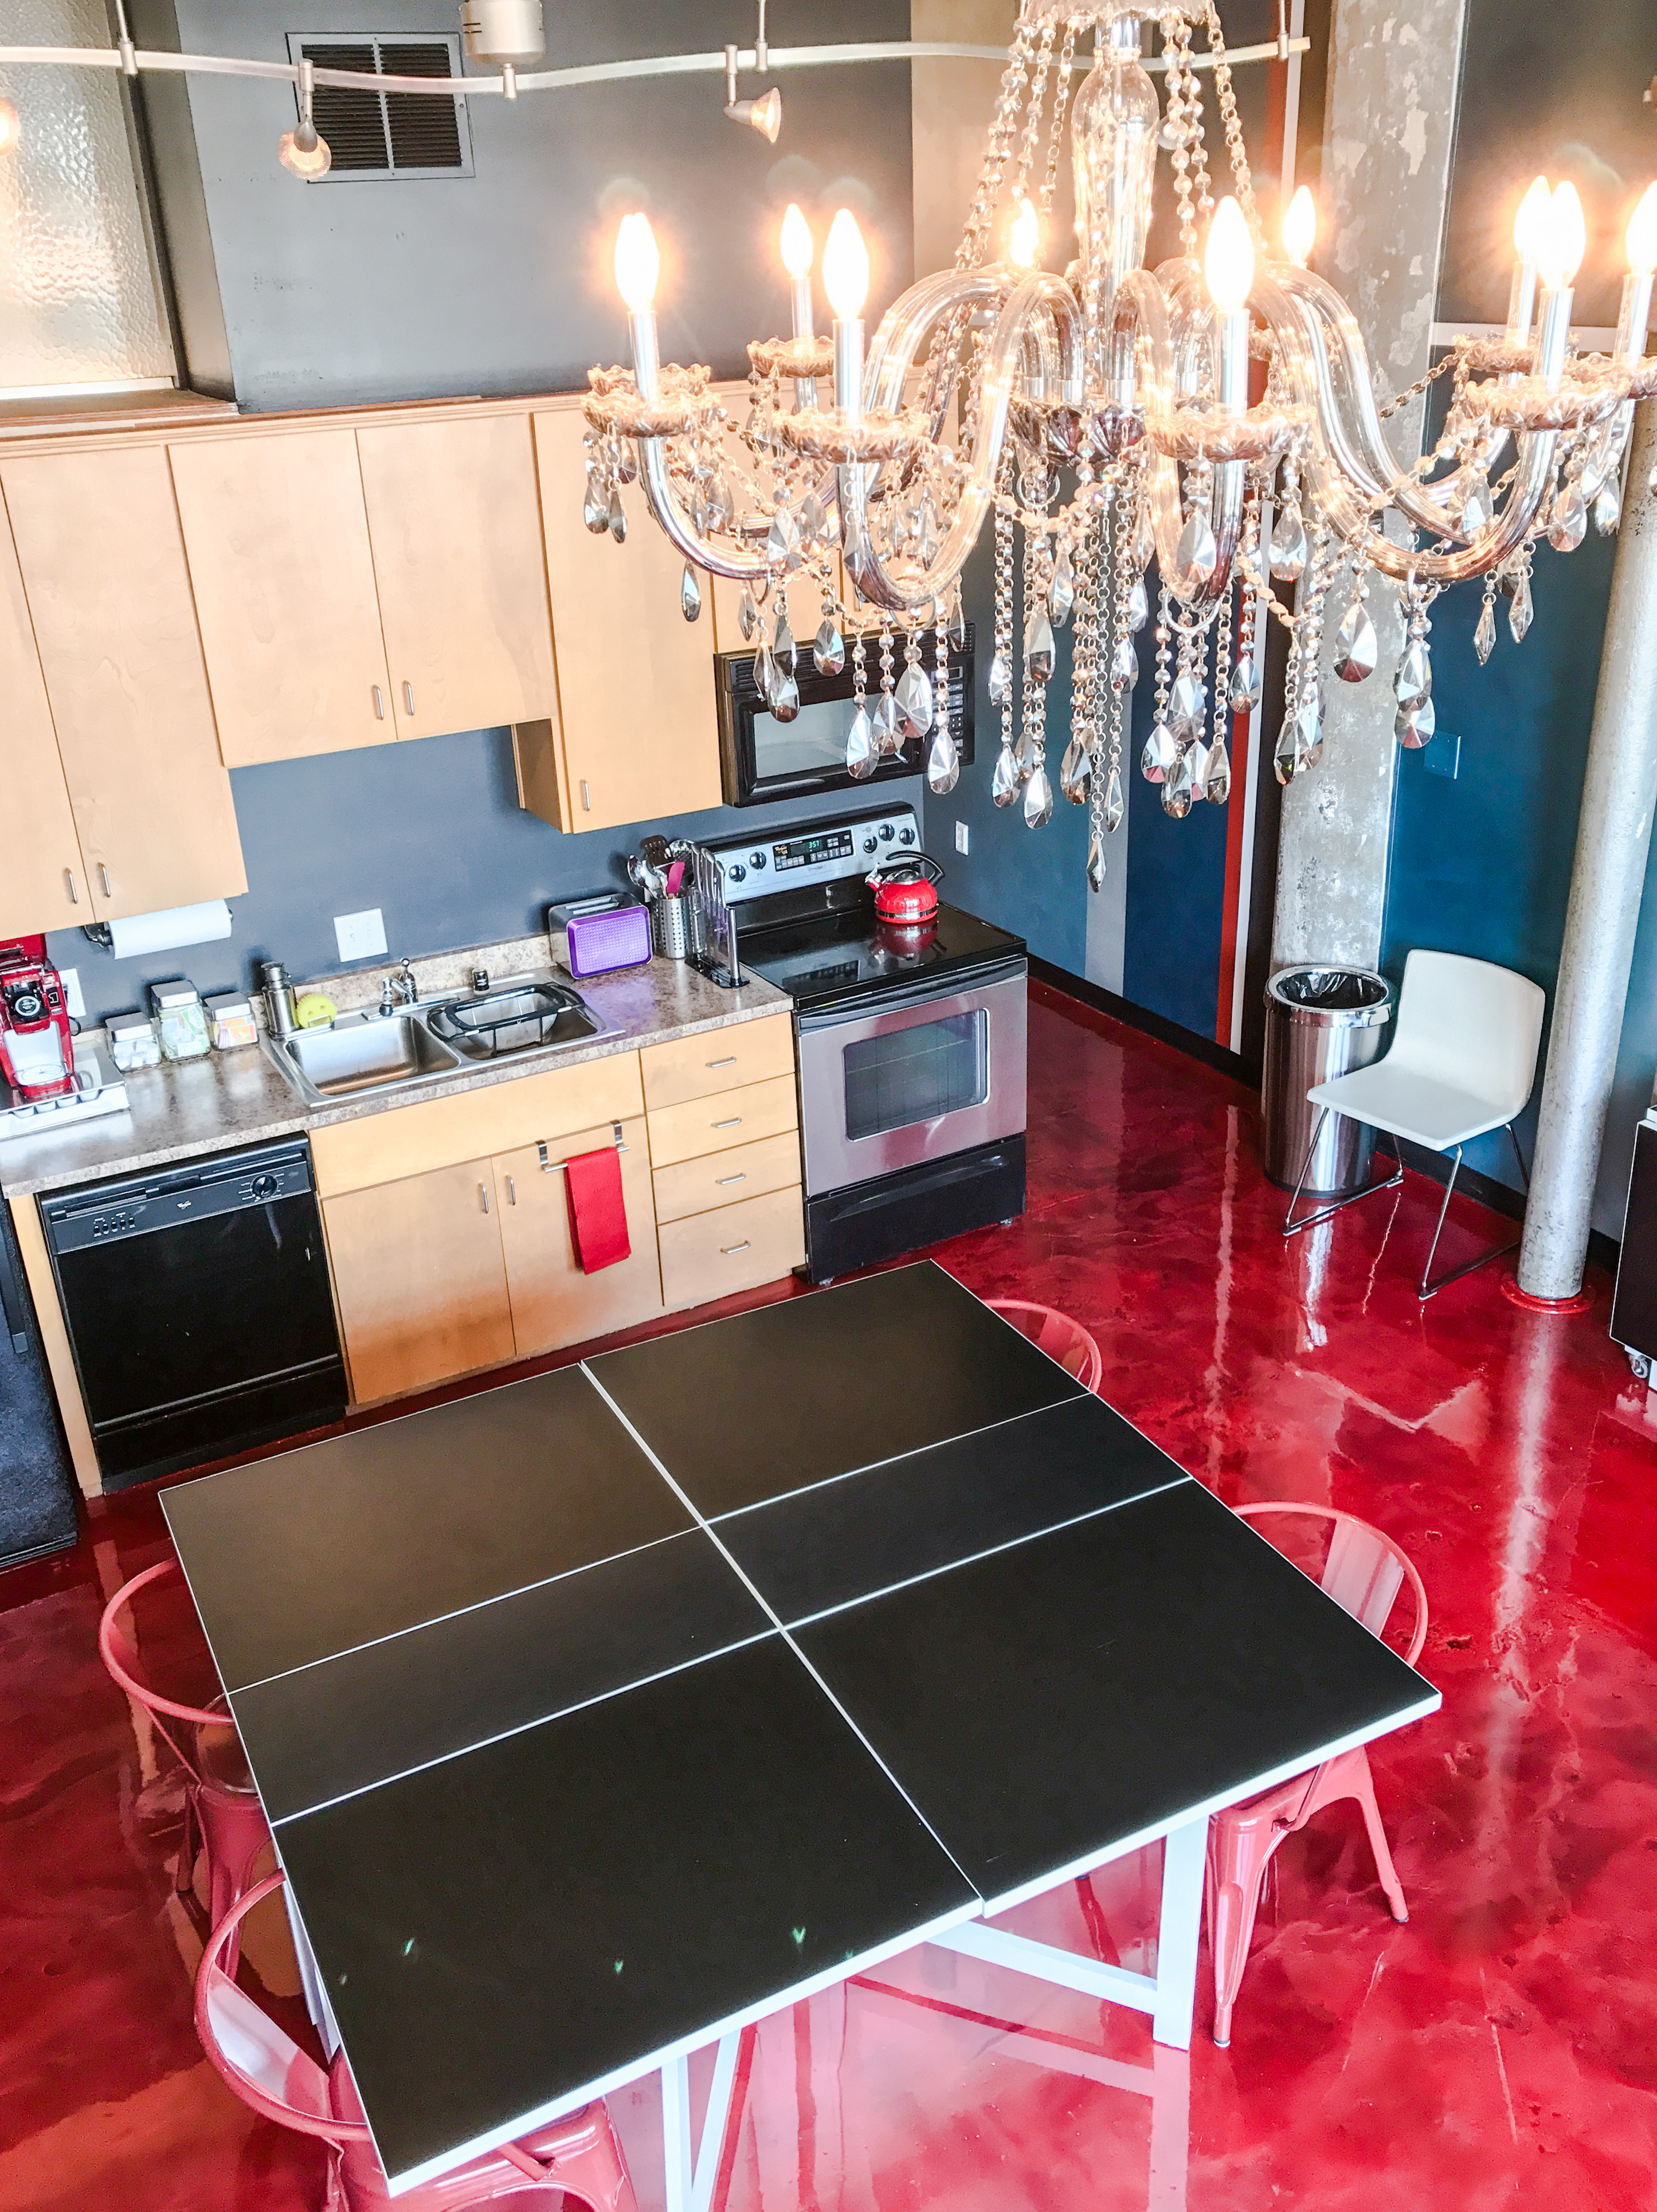 Loft Reverie Hotel 809 - Kitchen + Dining + Hosting + Events